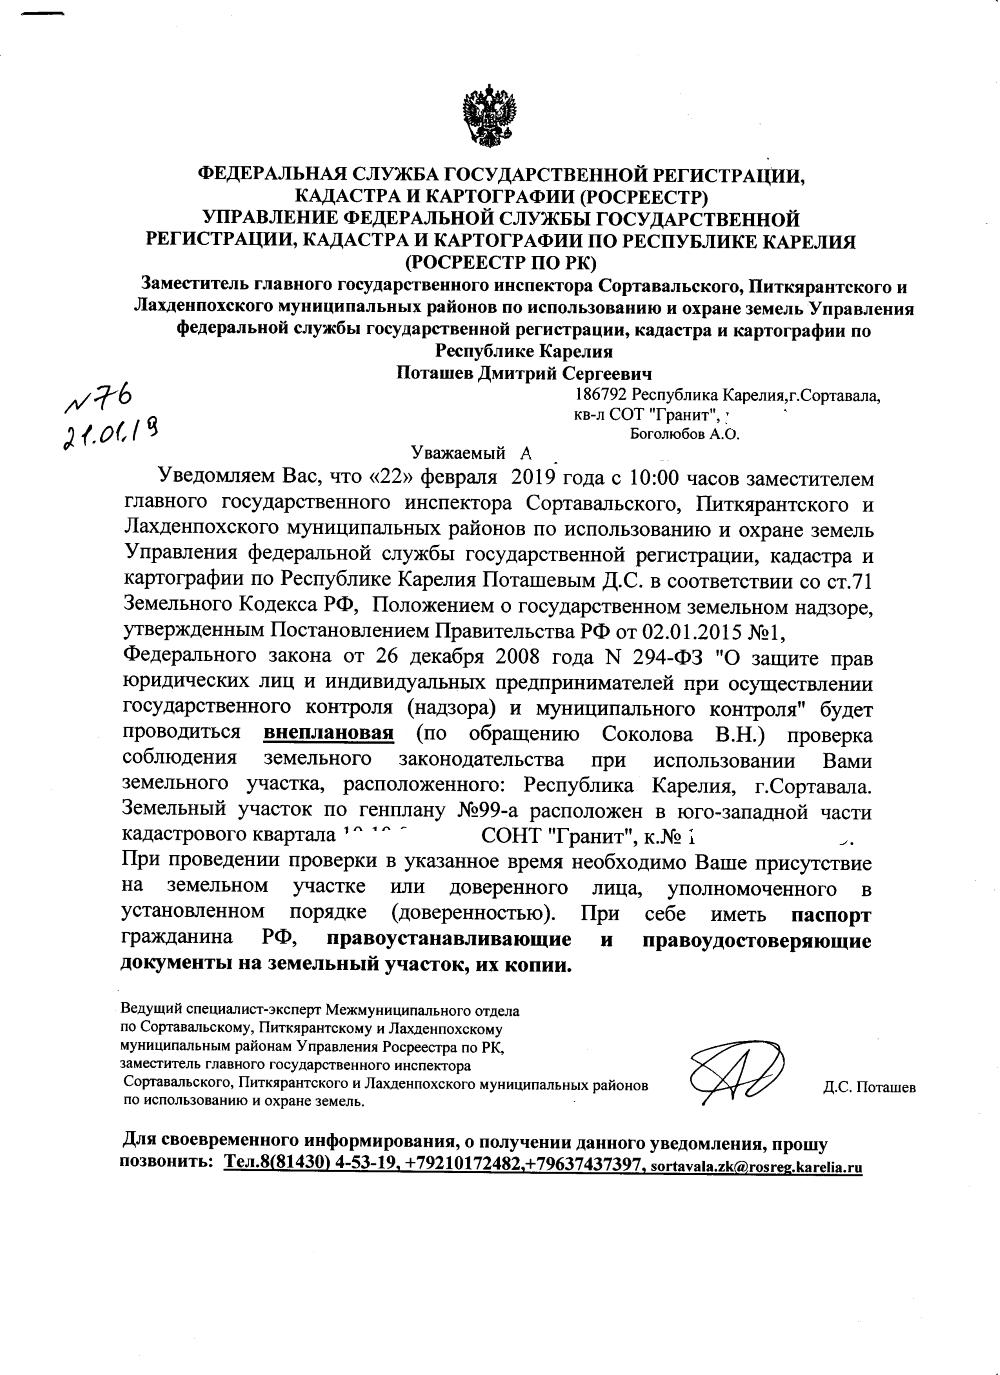 https://sontgranit.ru/forum/img/sokol/20190121-письмо-поташева1.png